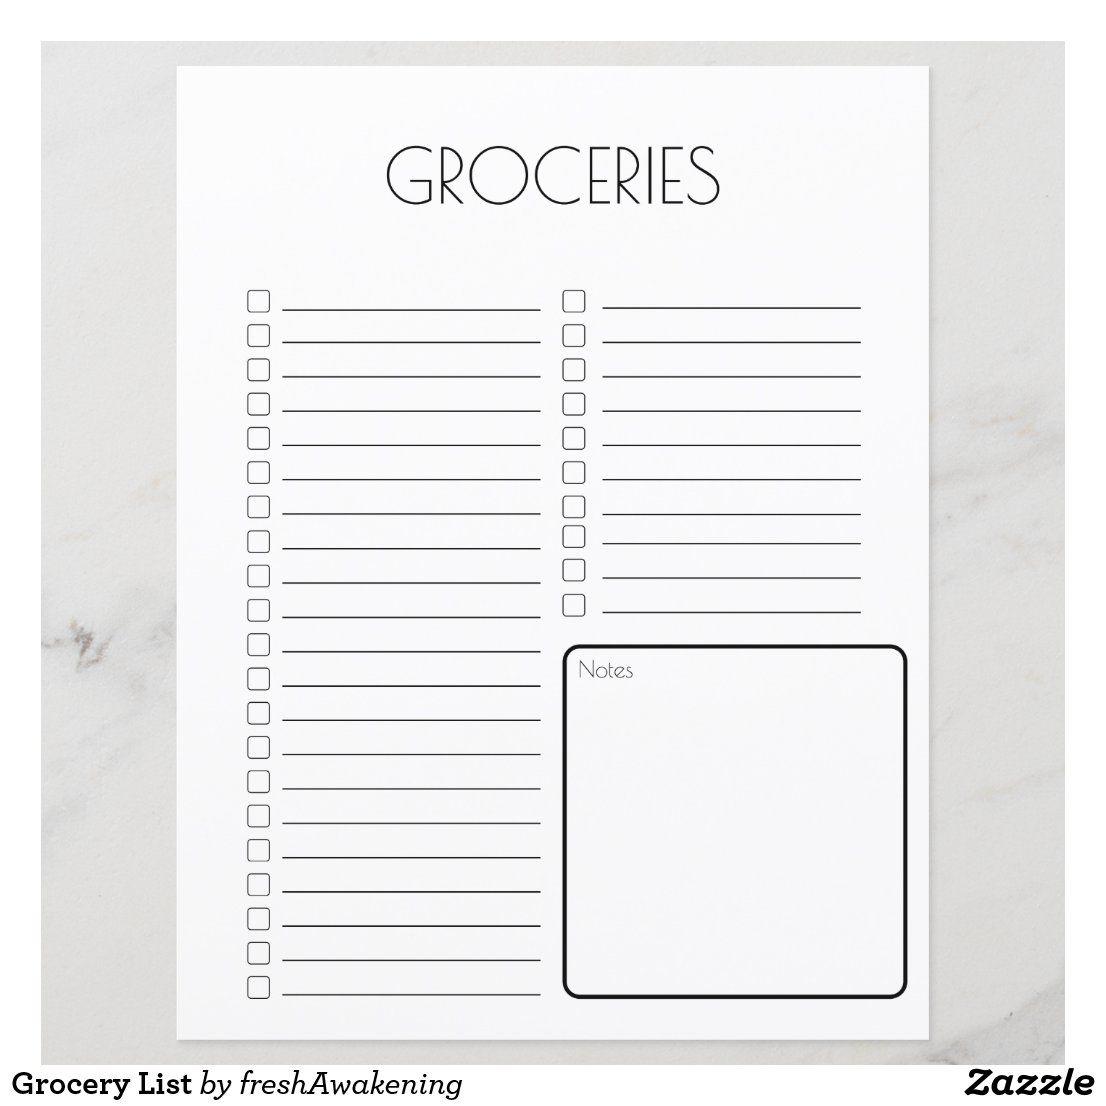 Grocery List Zazzle Com Free Printable Grocery List Templates Free Printable Grocery Shopping List Grocery Shopping List Template